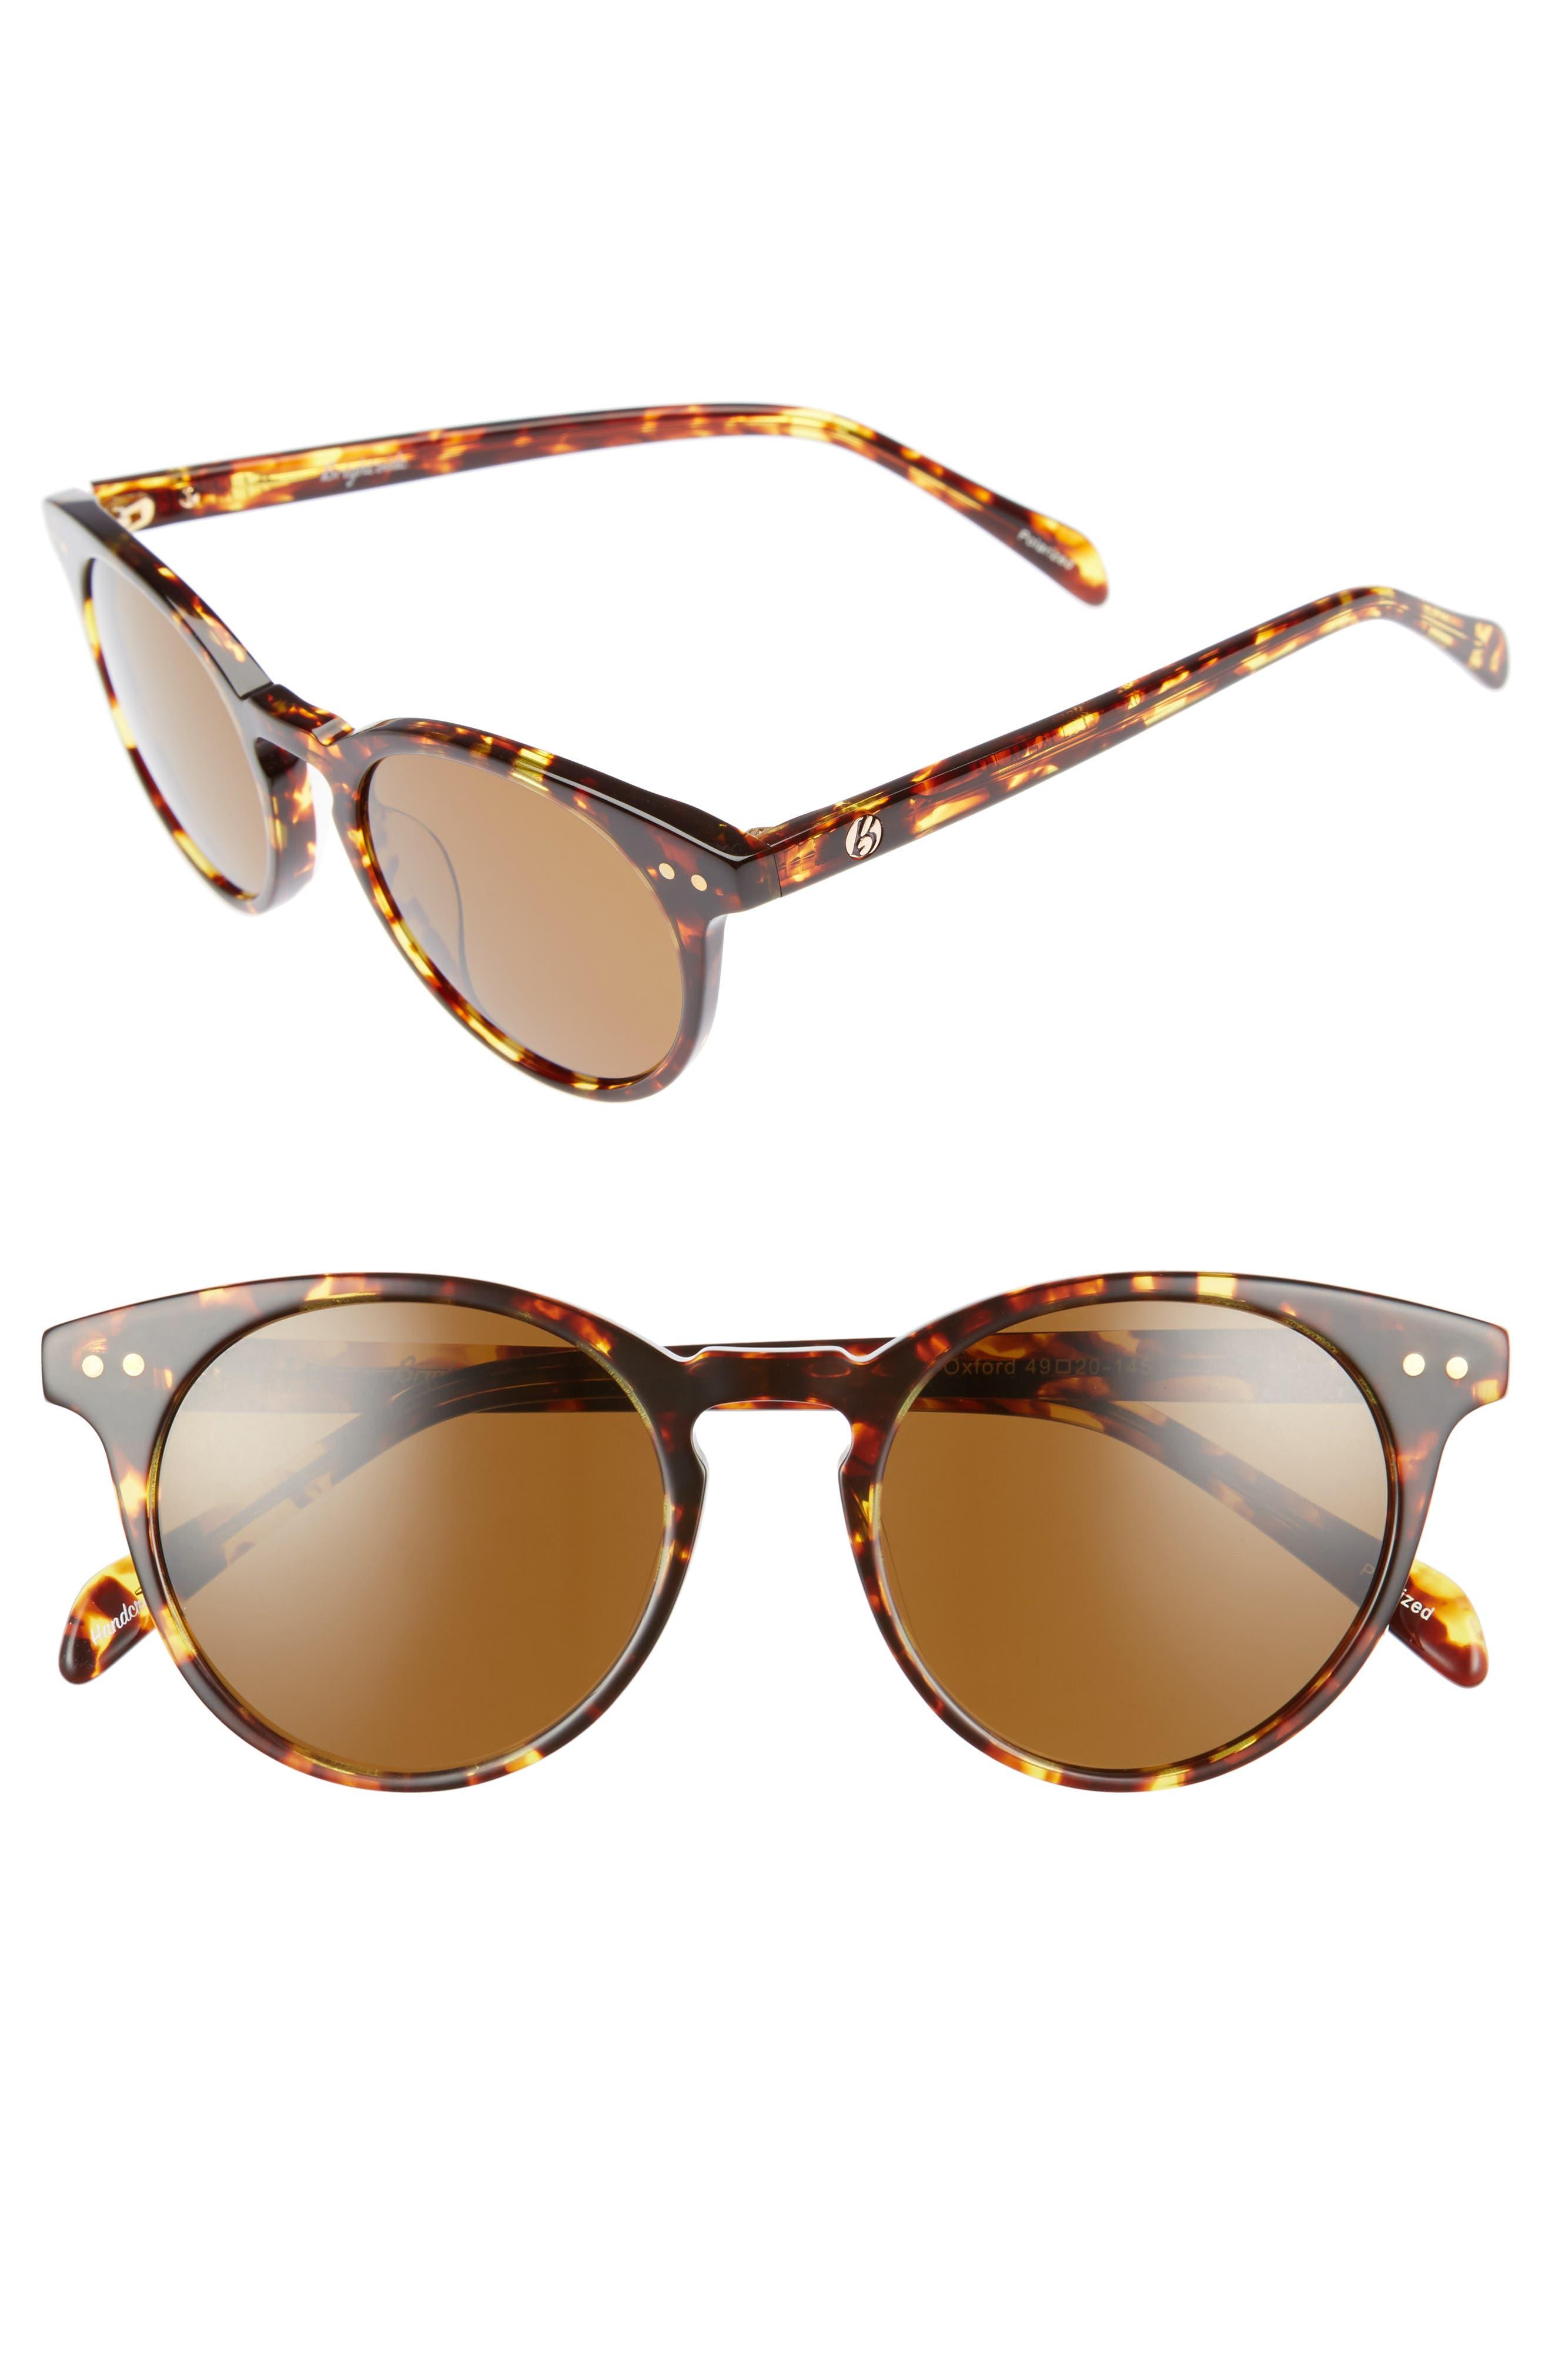 Alternate Image 1 Selected - Brightside Oxford 49mm Polarized Sunglasses